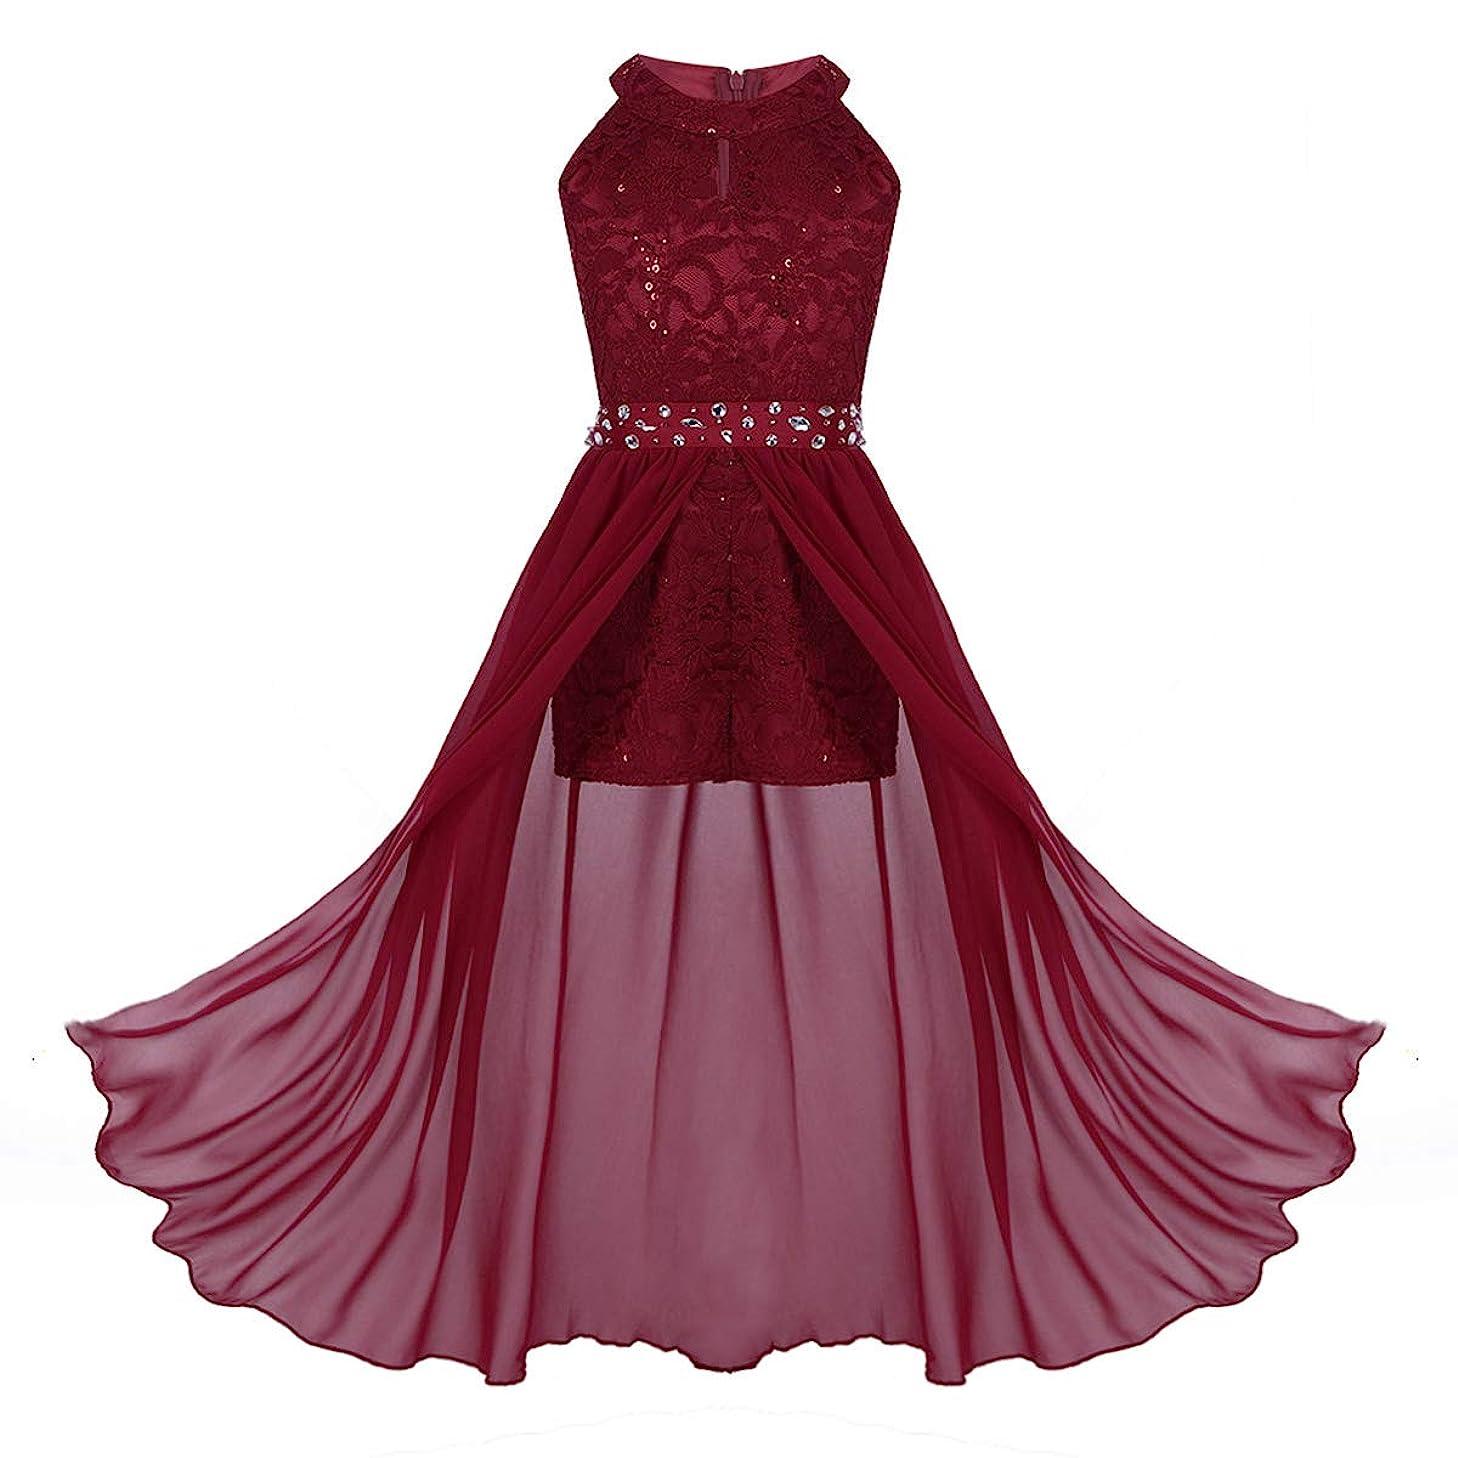 MSemis Kids Girls Floral Lace Rhinestone Long Romper Dress for Pageant Birthday Party School Dancewear